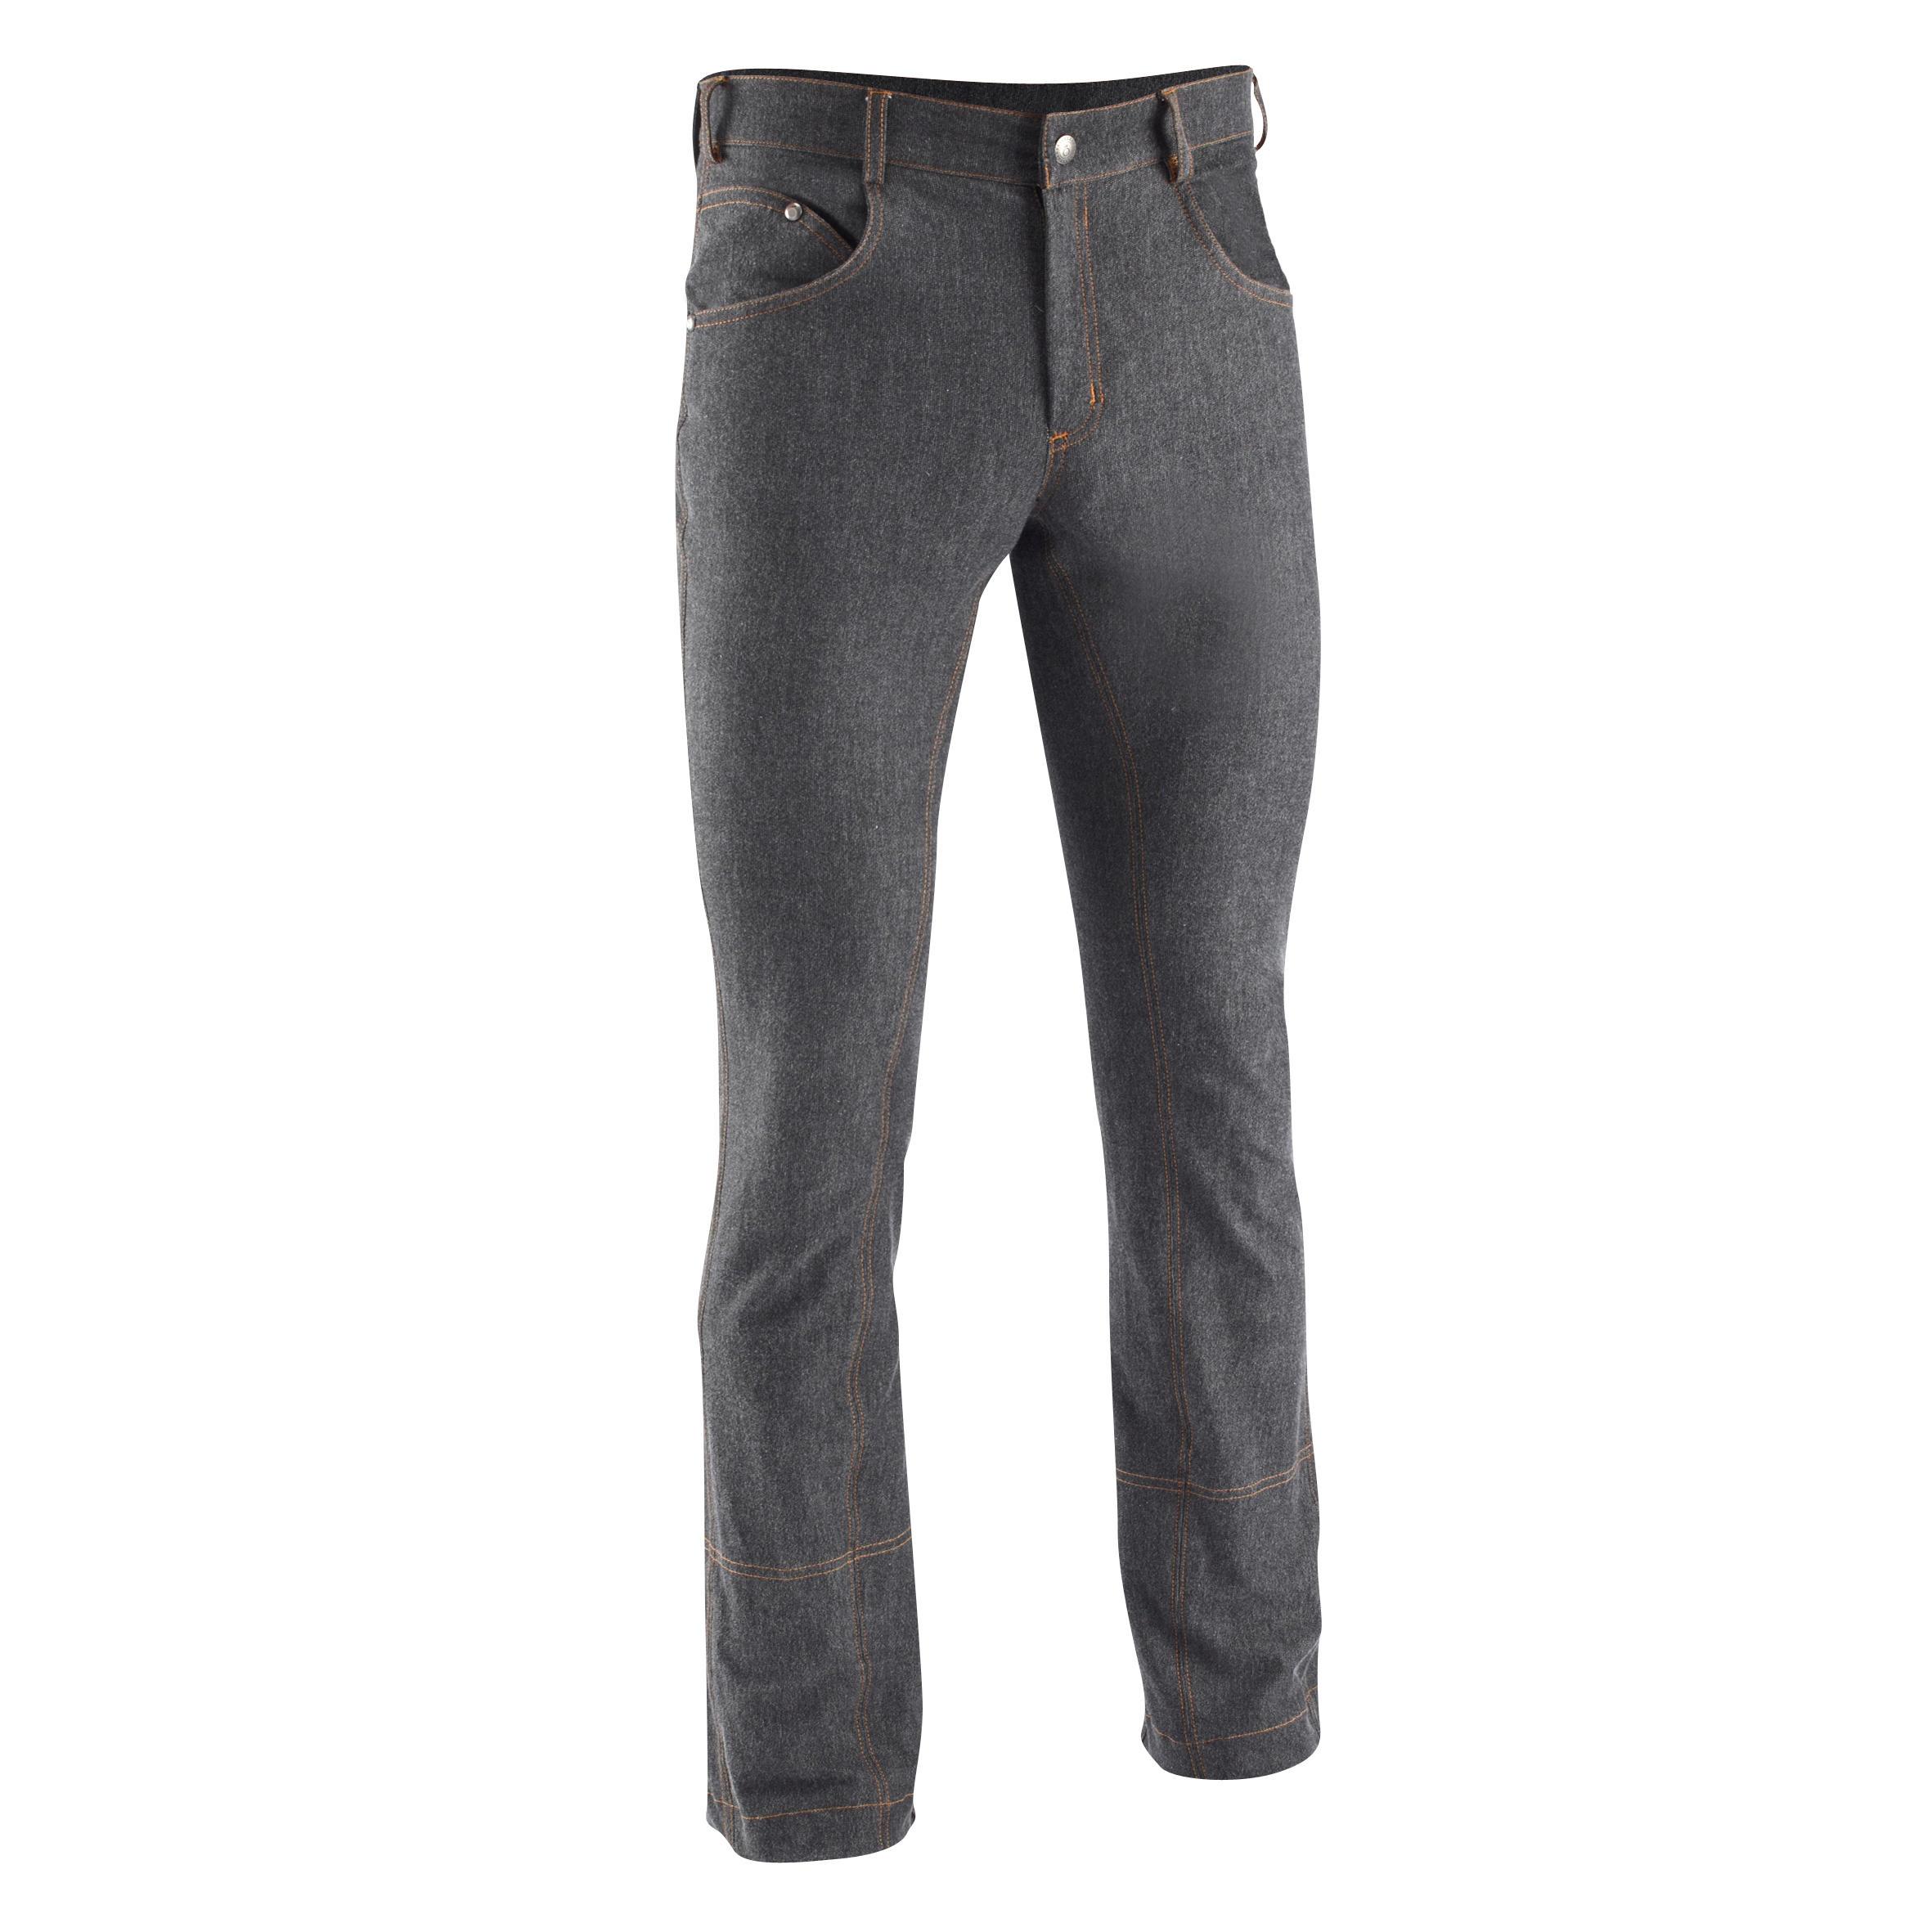 Jodhpurreithose Jeans Herren schwarz | Sportbekleidung > Sporthosen > Sonstige Sporthosen | Fouganza